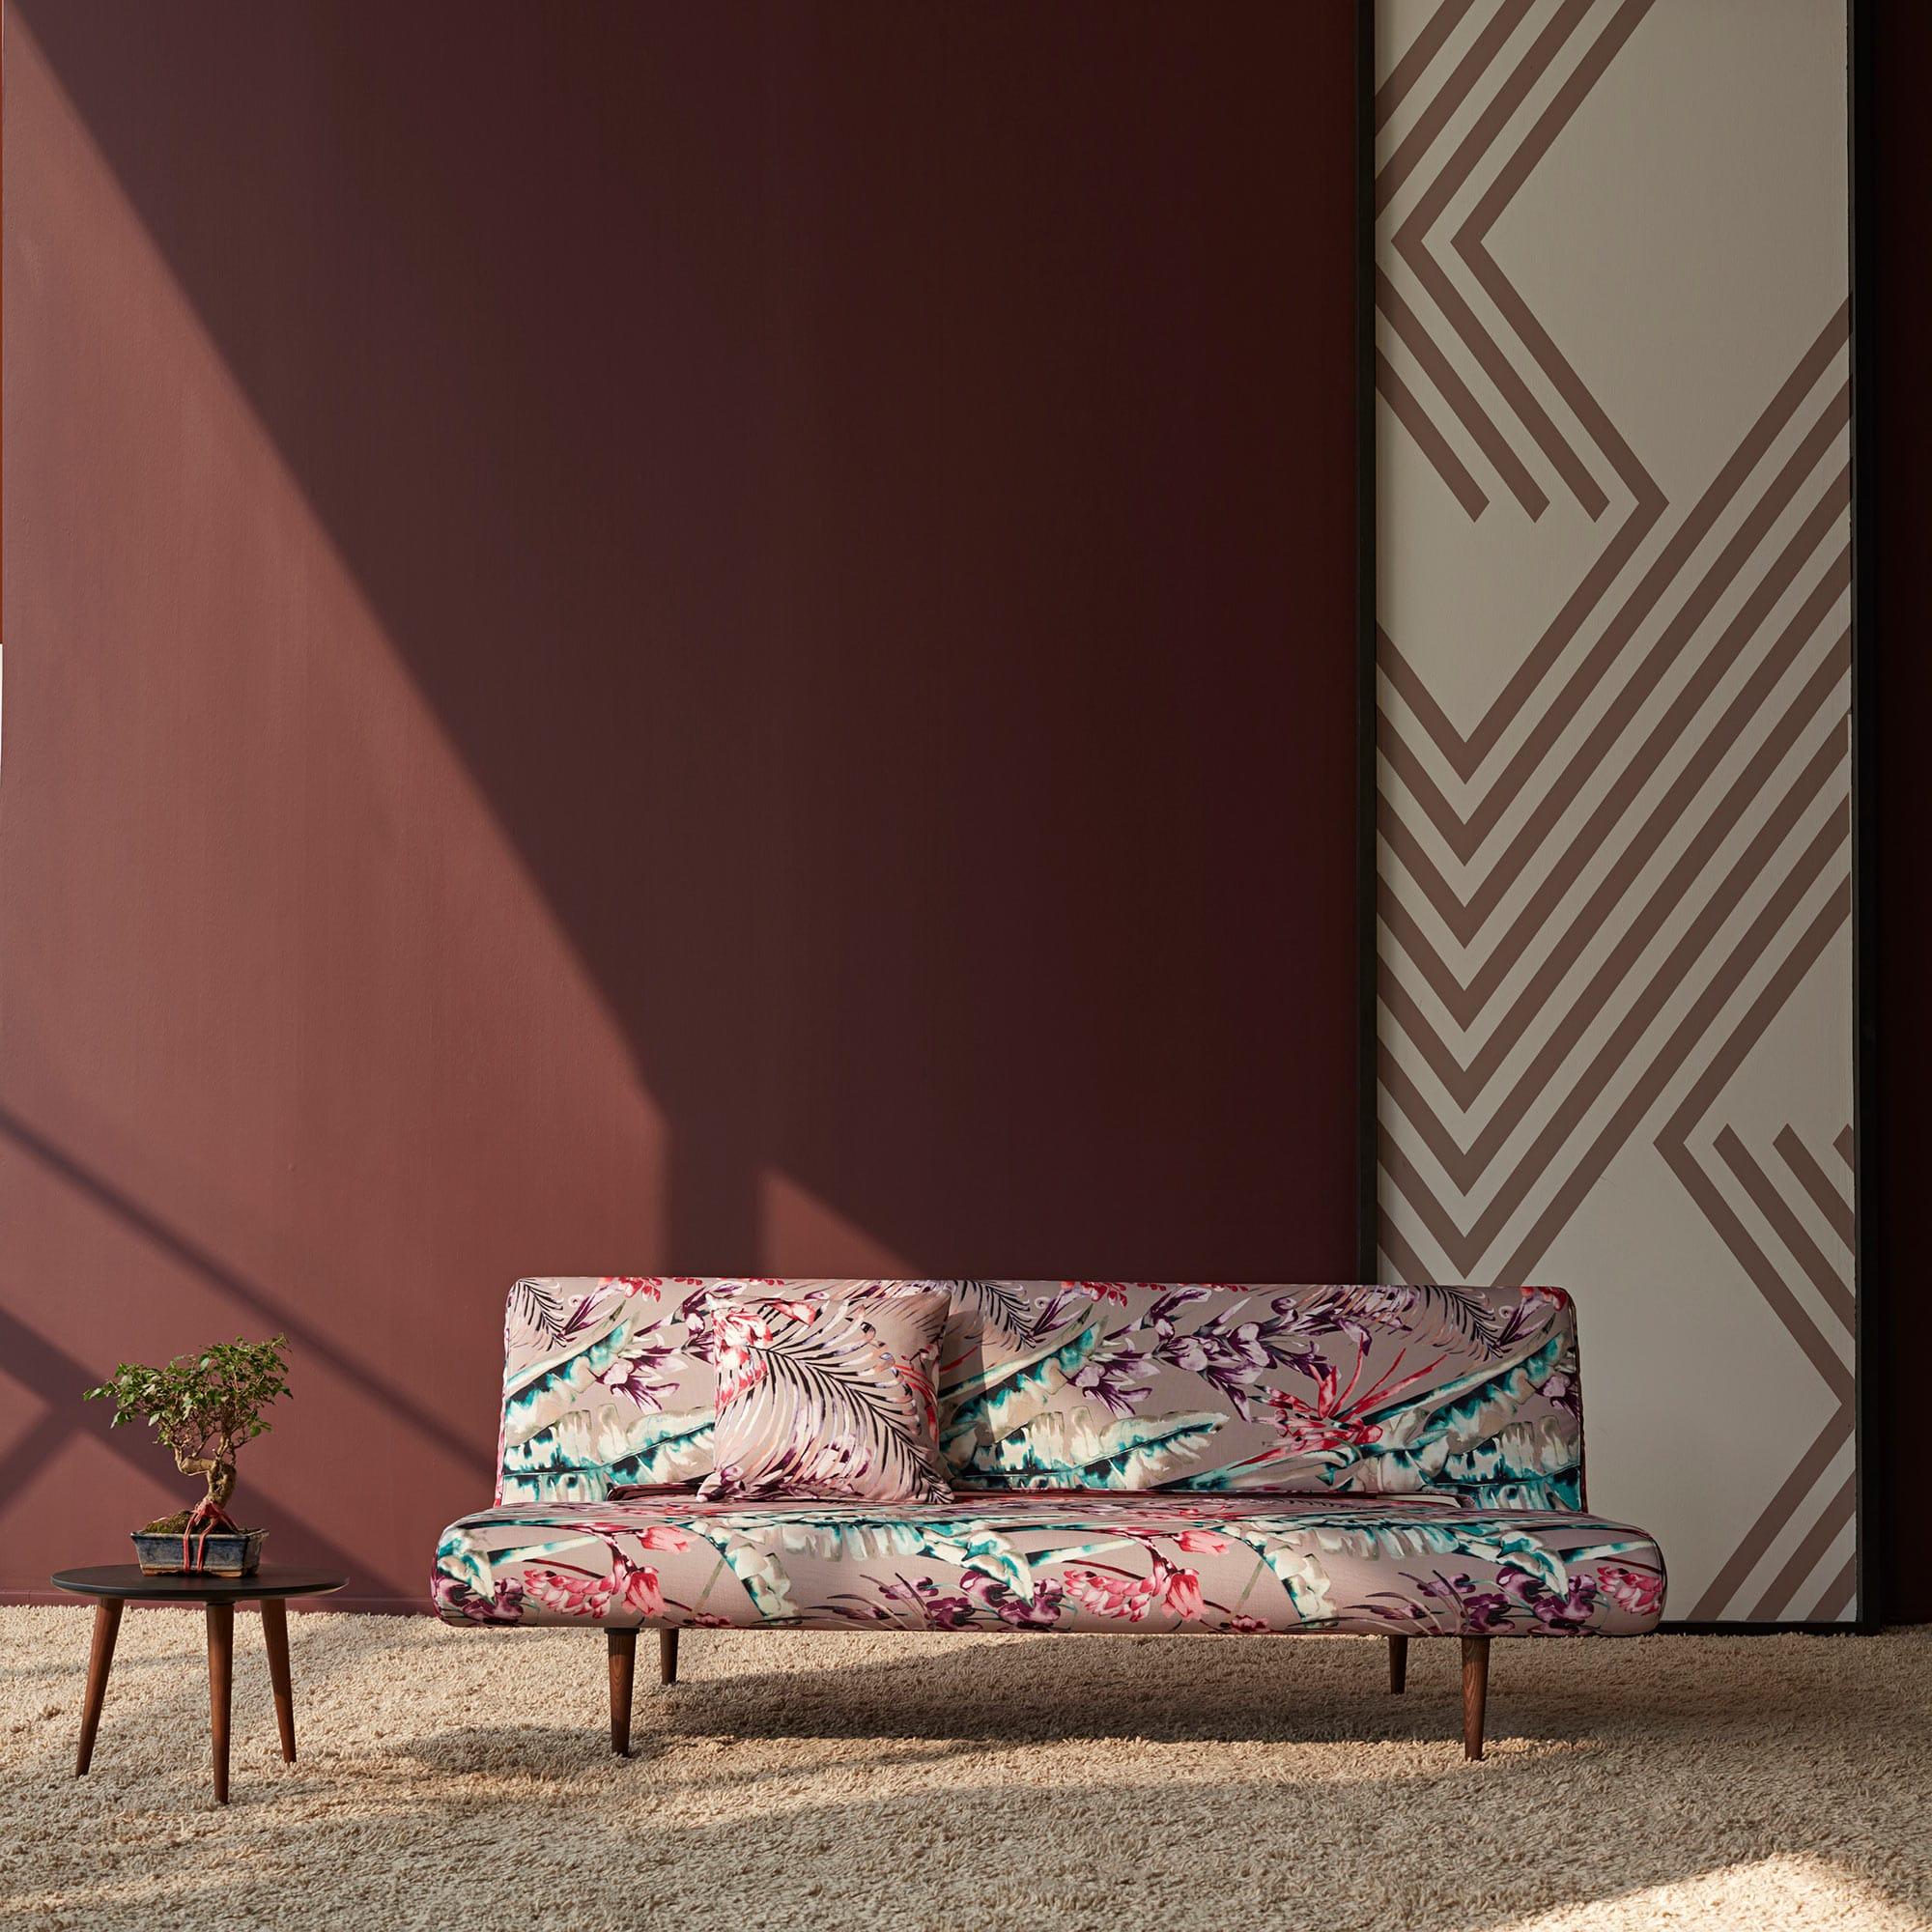 Unfurl Sofa Bed Botany By Innovation (Innovation USA)